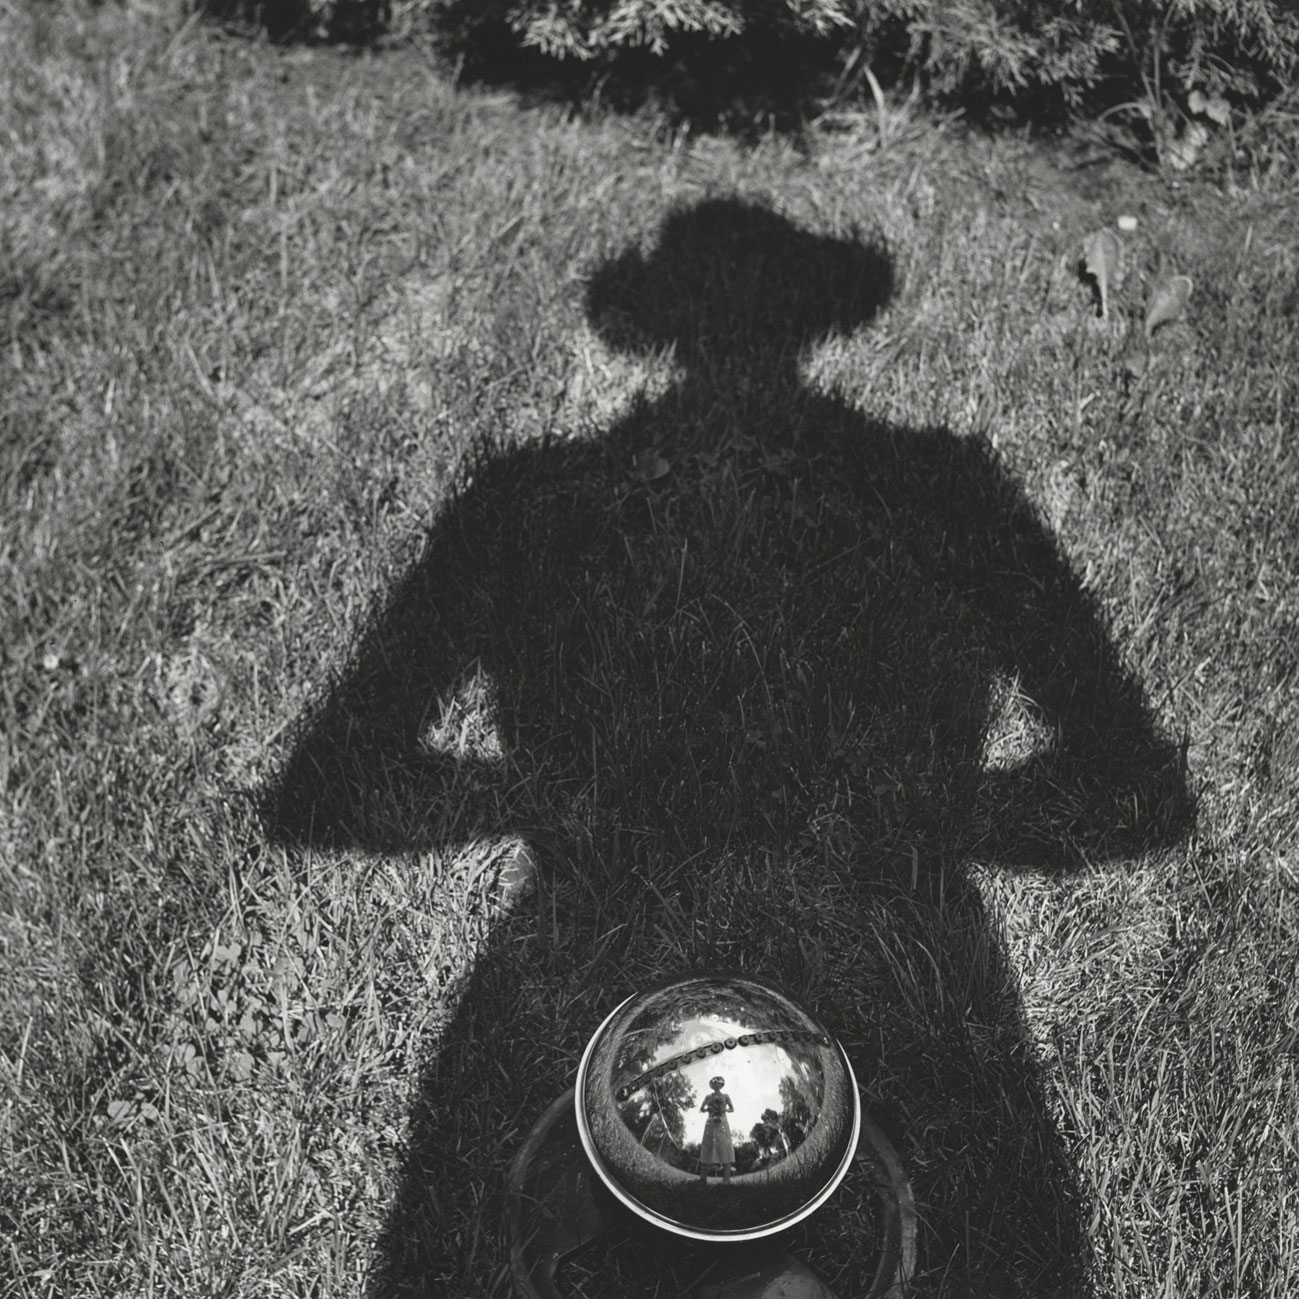 a02_-VIVIAN-MAIER-SELF-PORTRAIT-UNDATED-PALAZZO-PALLAVICINI-BOLOGNA-copyright-Vivian-Maier-Maloof-Collection-Courtesy-Howard-Greendberg-Gallery-New-York